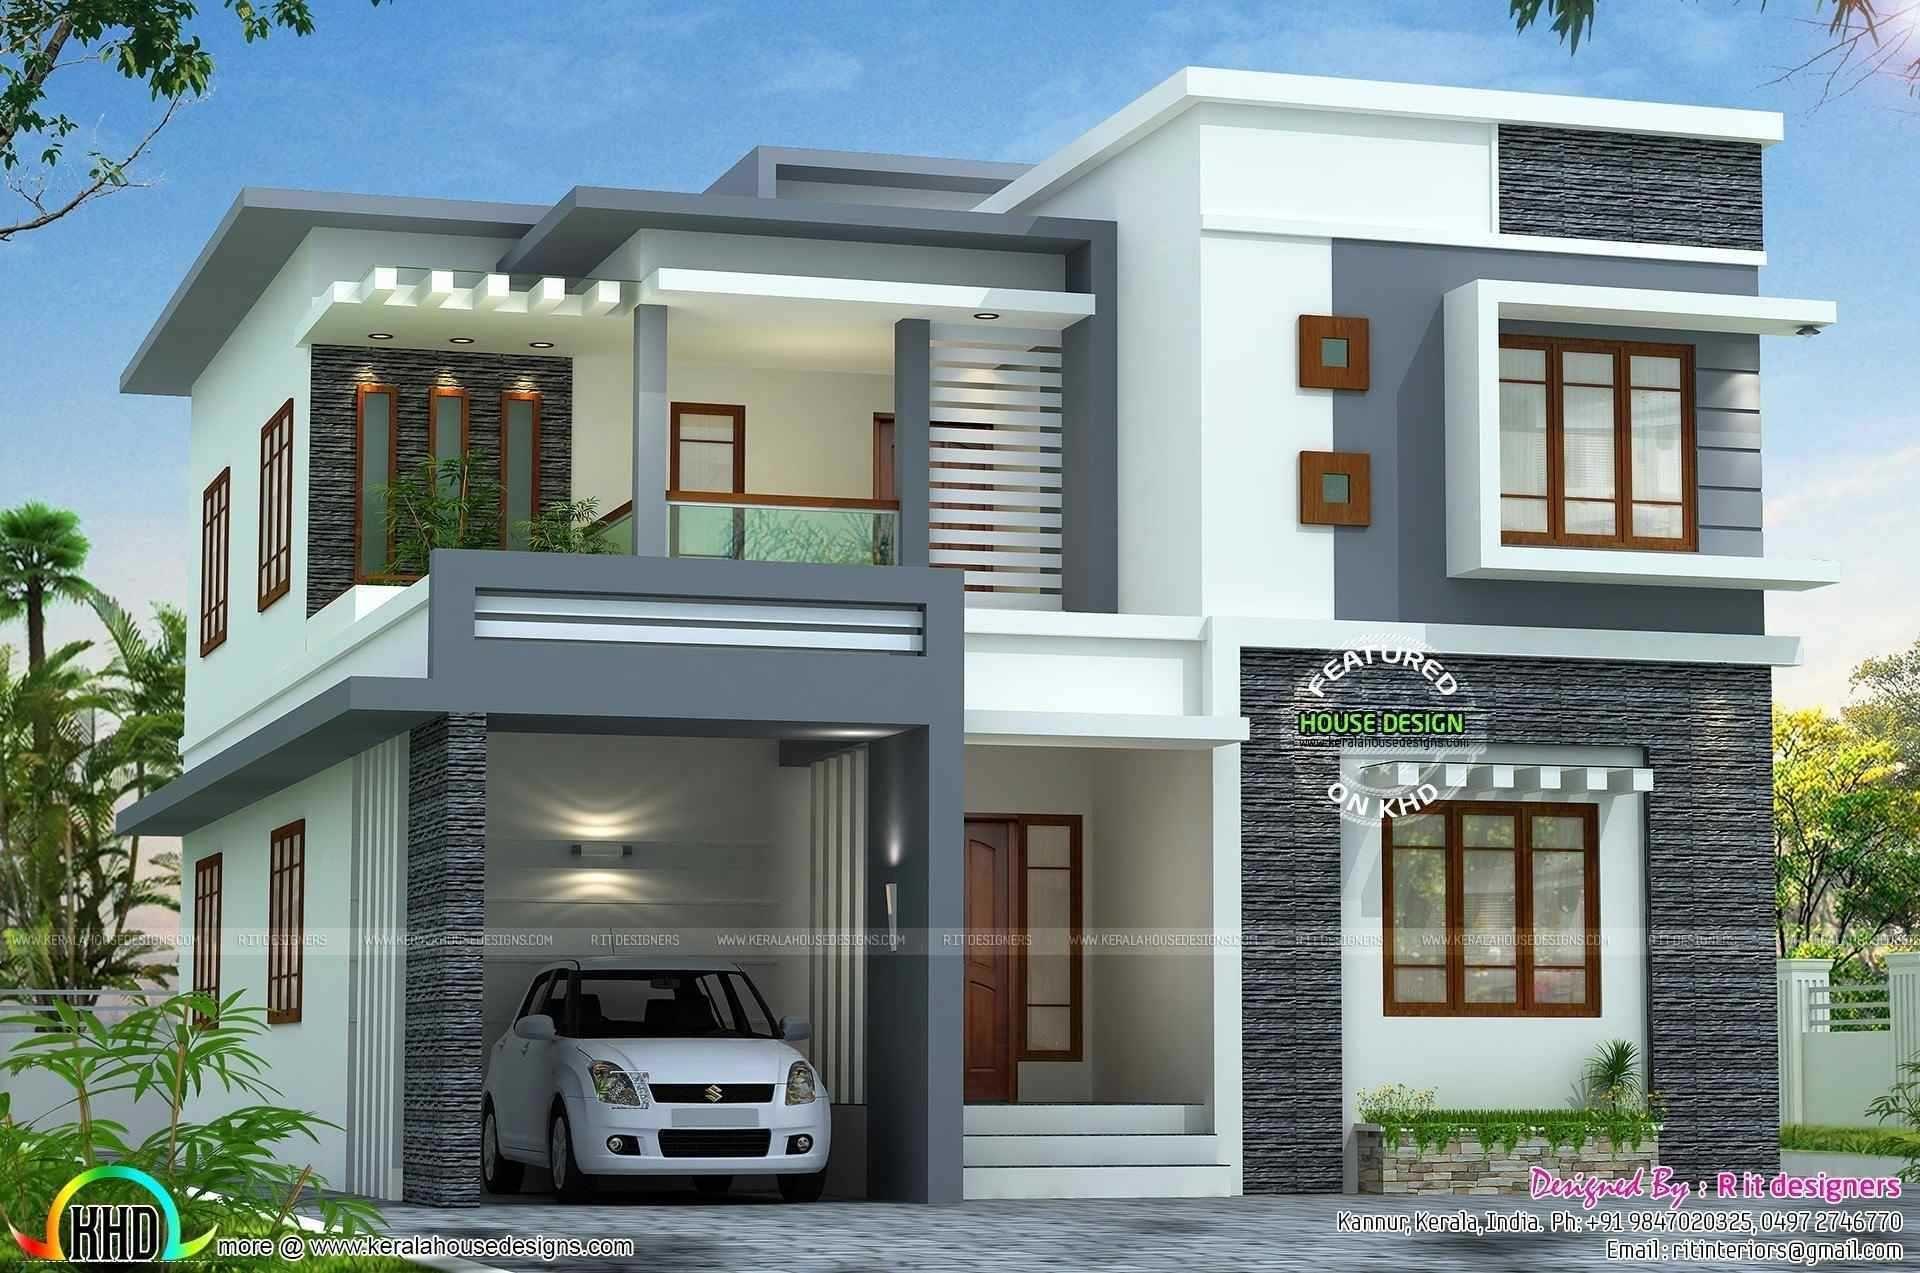 Mansion Huge Minecraft House Ideas Luxury Mansion Huge Minecraft House Ideas 60 Beautiful Si Kerala House Design Two Story House Design Duplex House Design